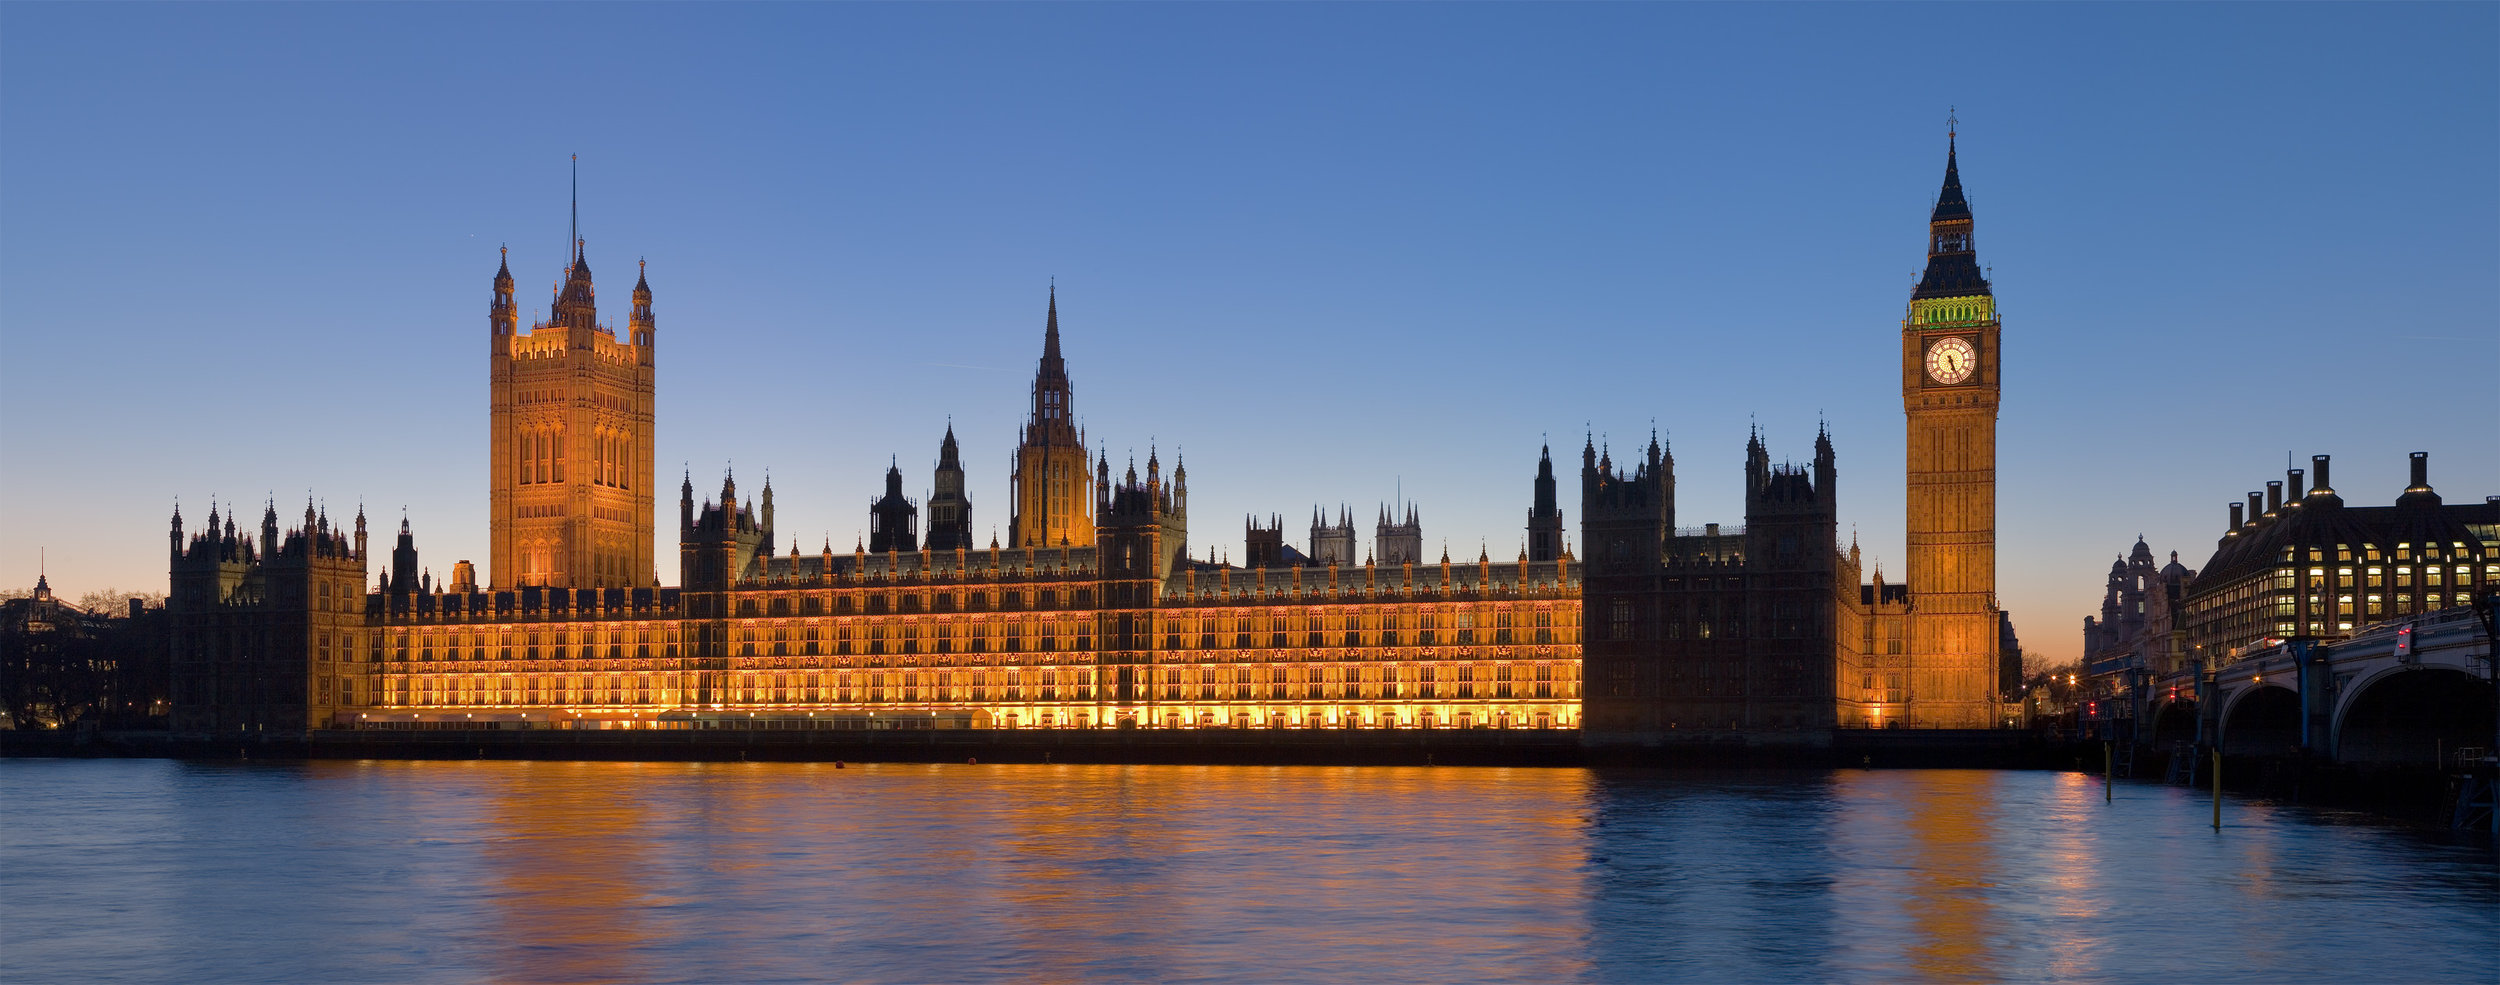 Palace_of_Westminster,_London_-_Feb_2007.jpg